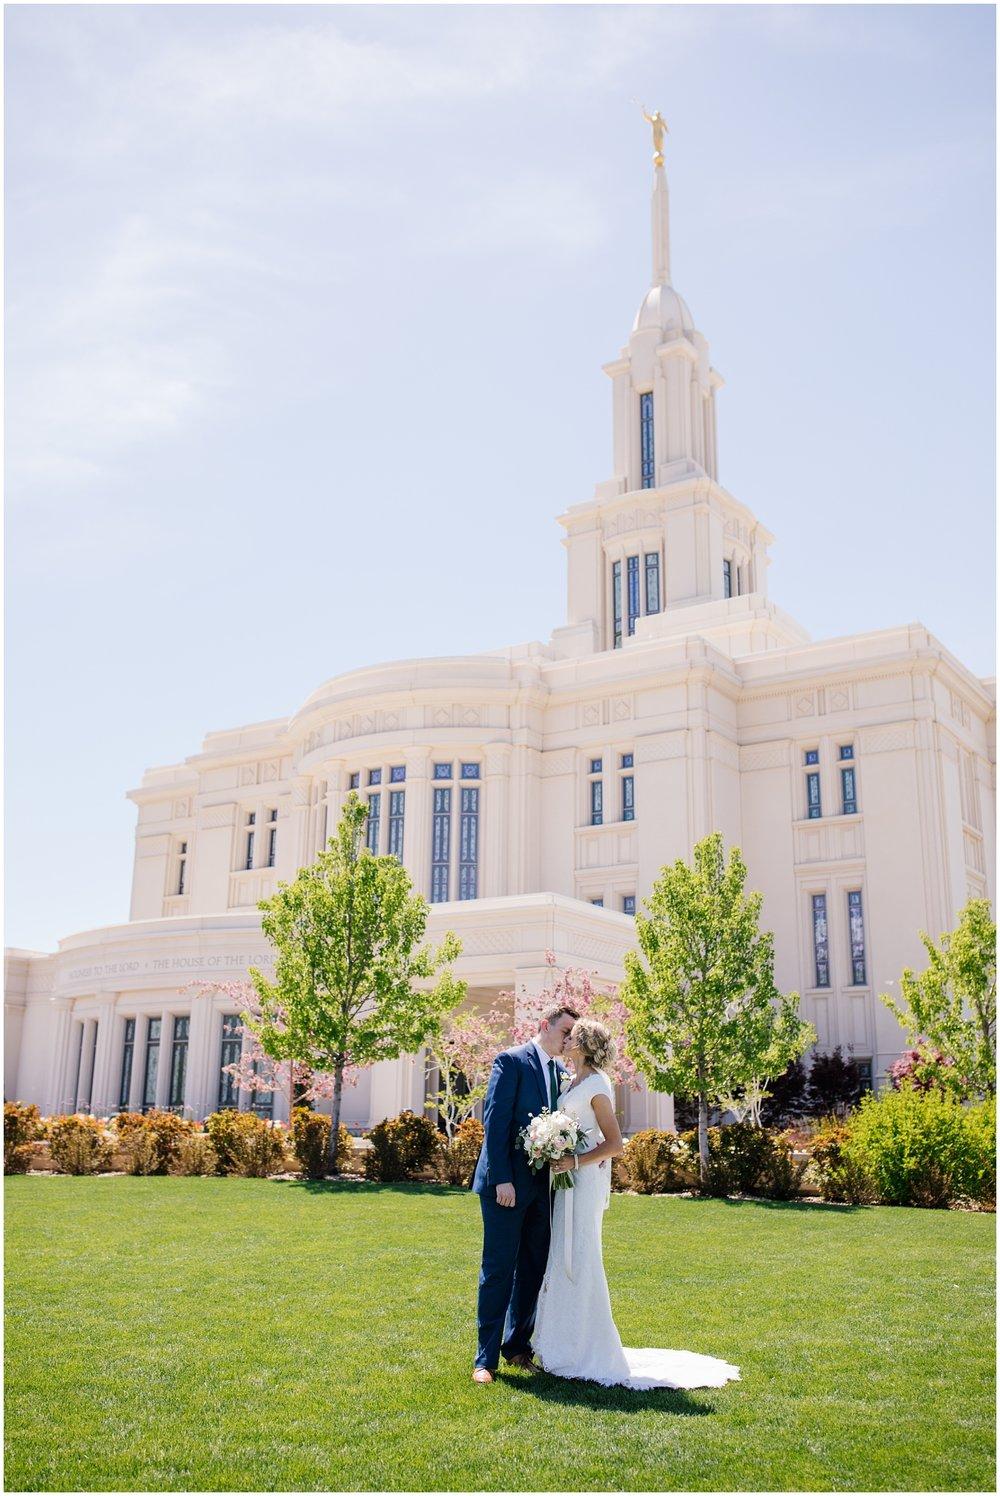 TA-Wedding-125_Lizzie-B-Imagery-Utah-Wedding-Photographer-Park-City-Salt-Lake-City-Thanksgiving-Point-Ashton-Gardens-Lehi-Utah.jpg